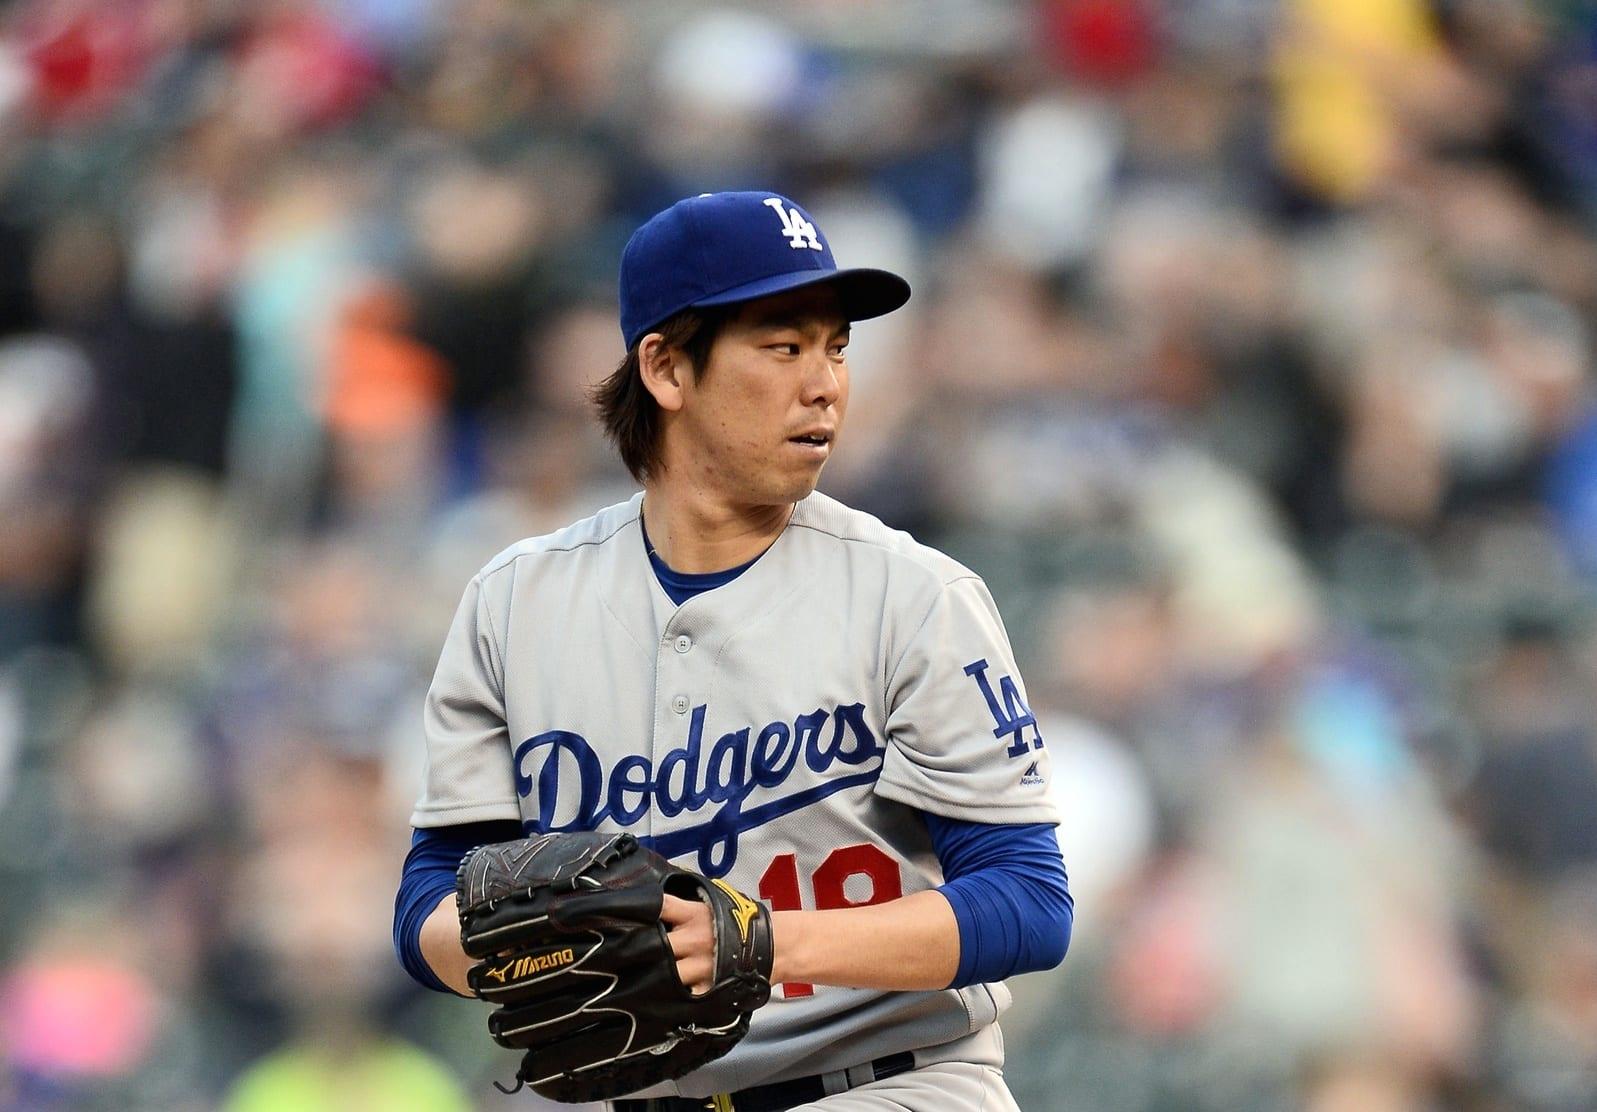 Recap: Kenta Maeda Sets Career High With 8 Strikeouts, Dodgers Beat Rockies